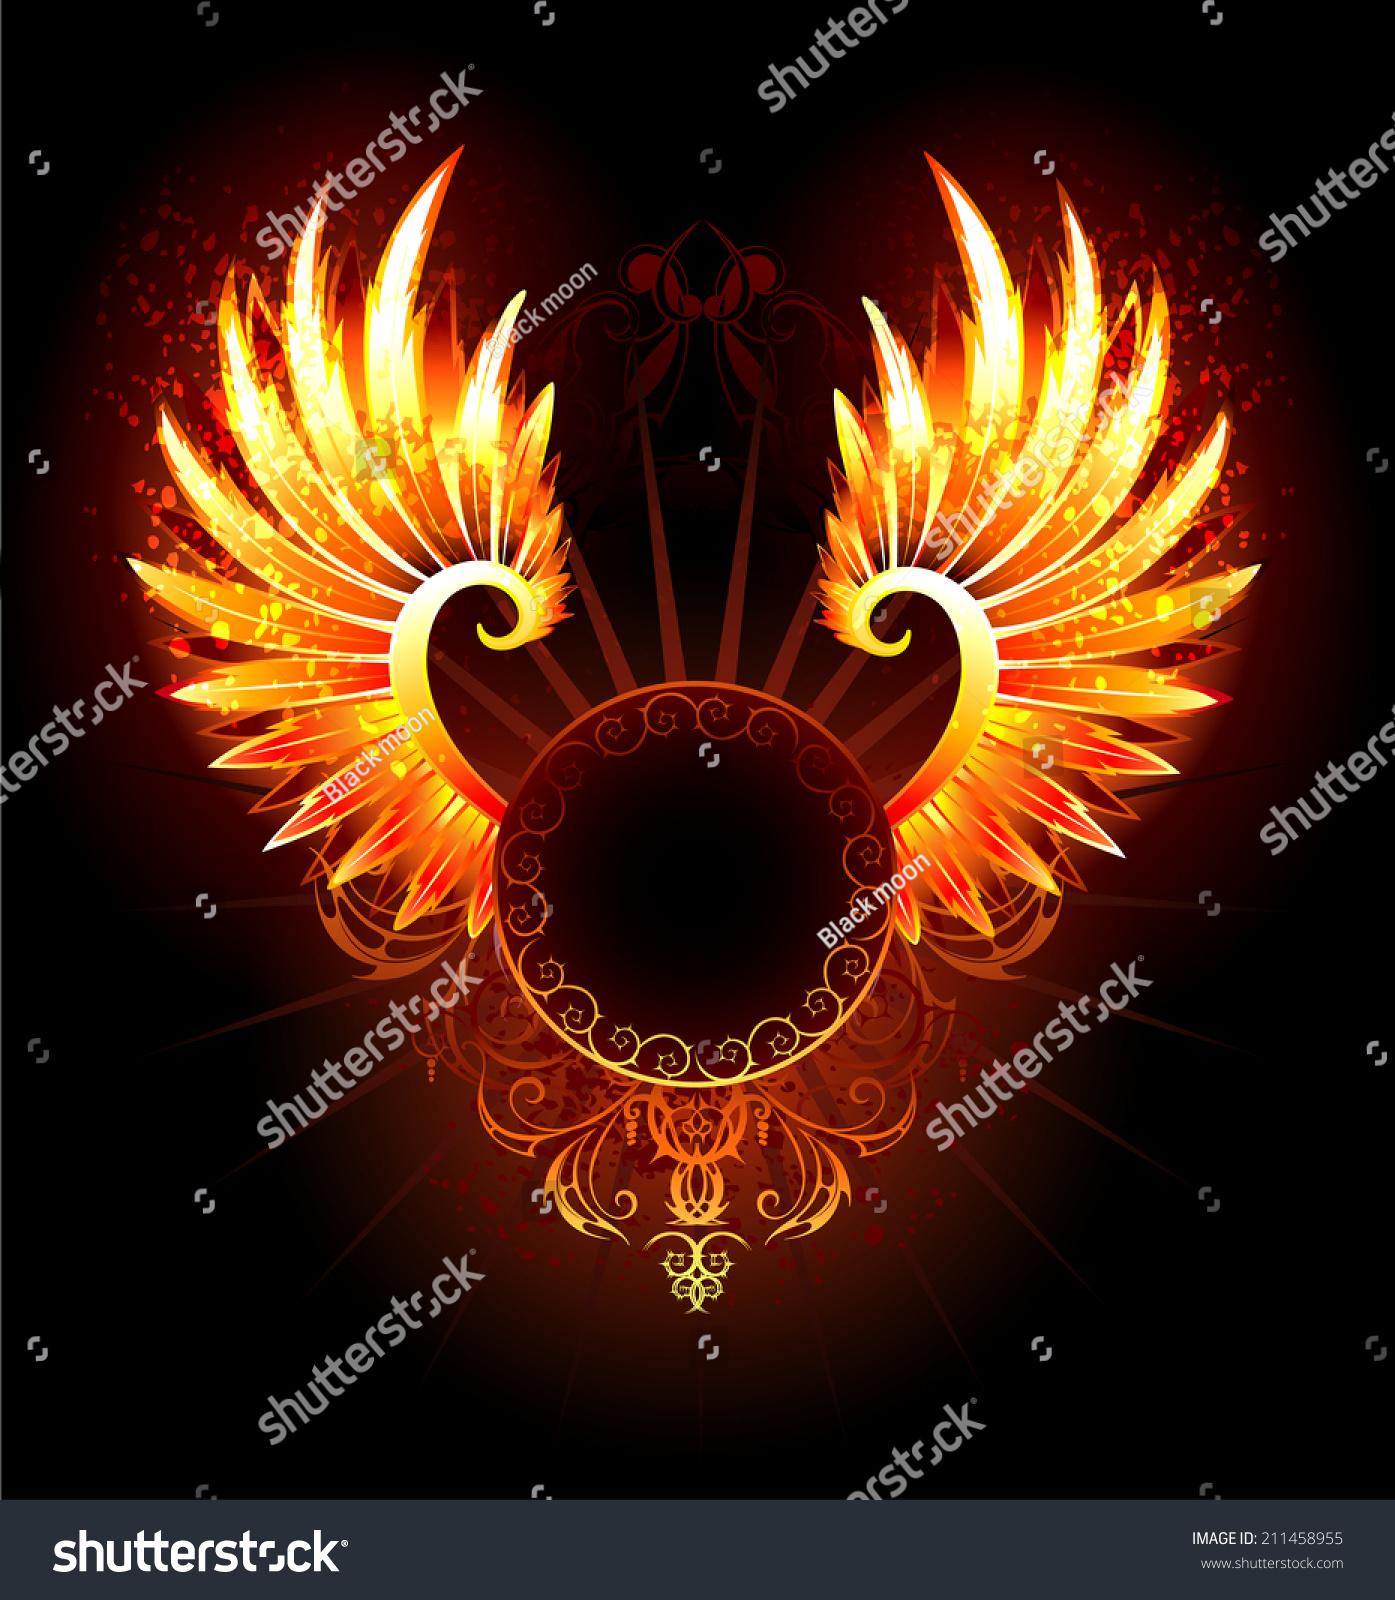 picsart配图素材翅膀